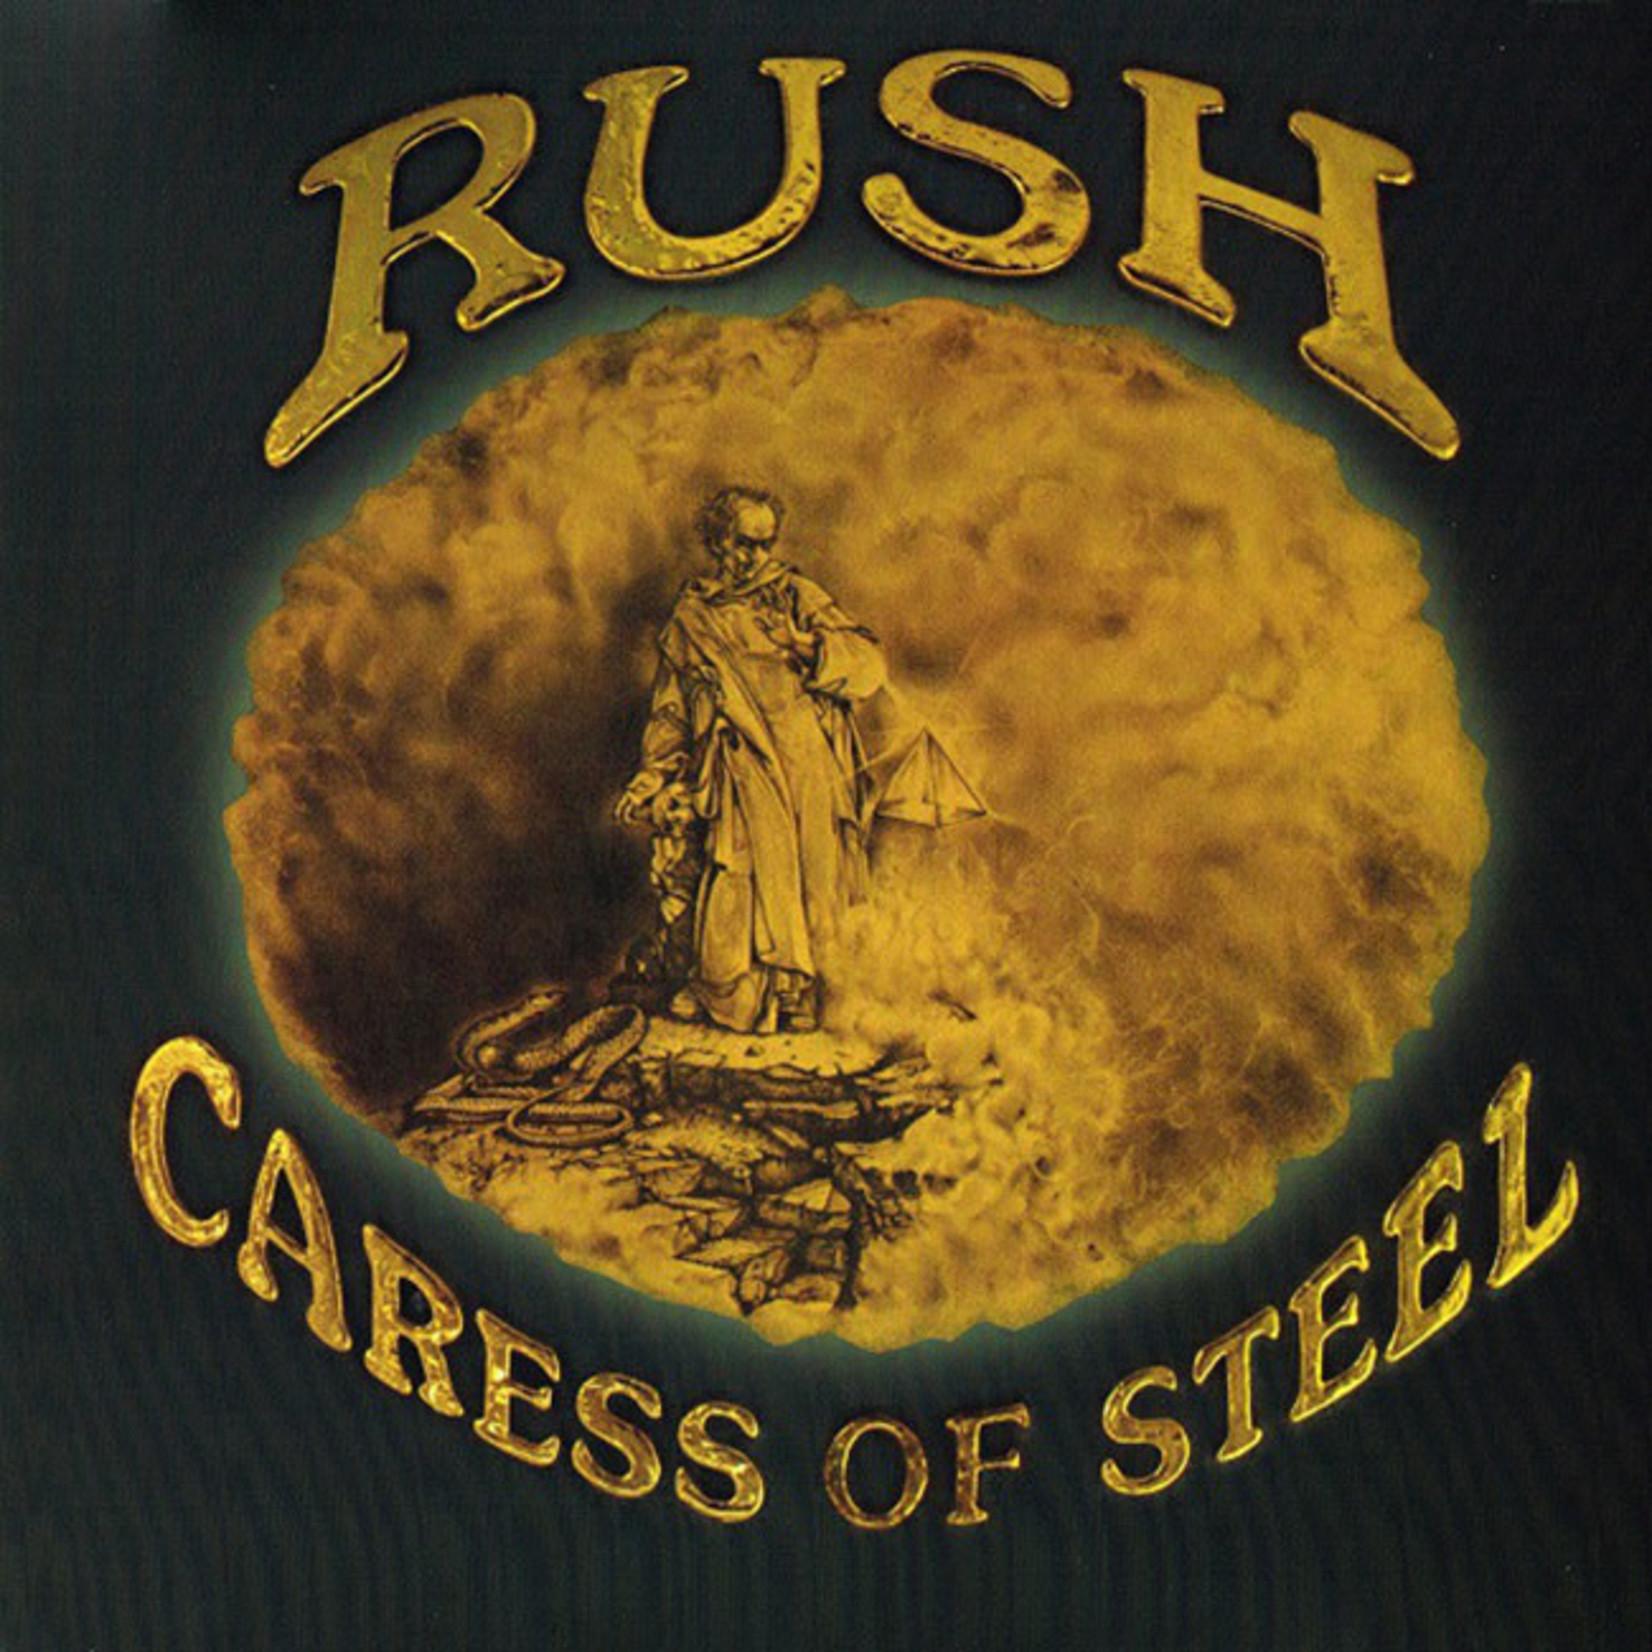 [New] Rush: Caress Of Steel (2LP)